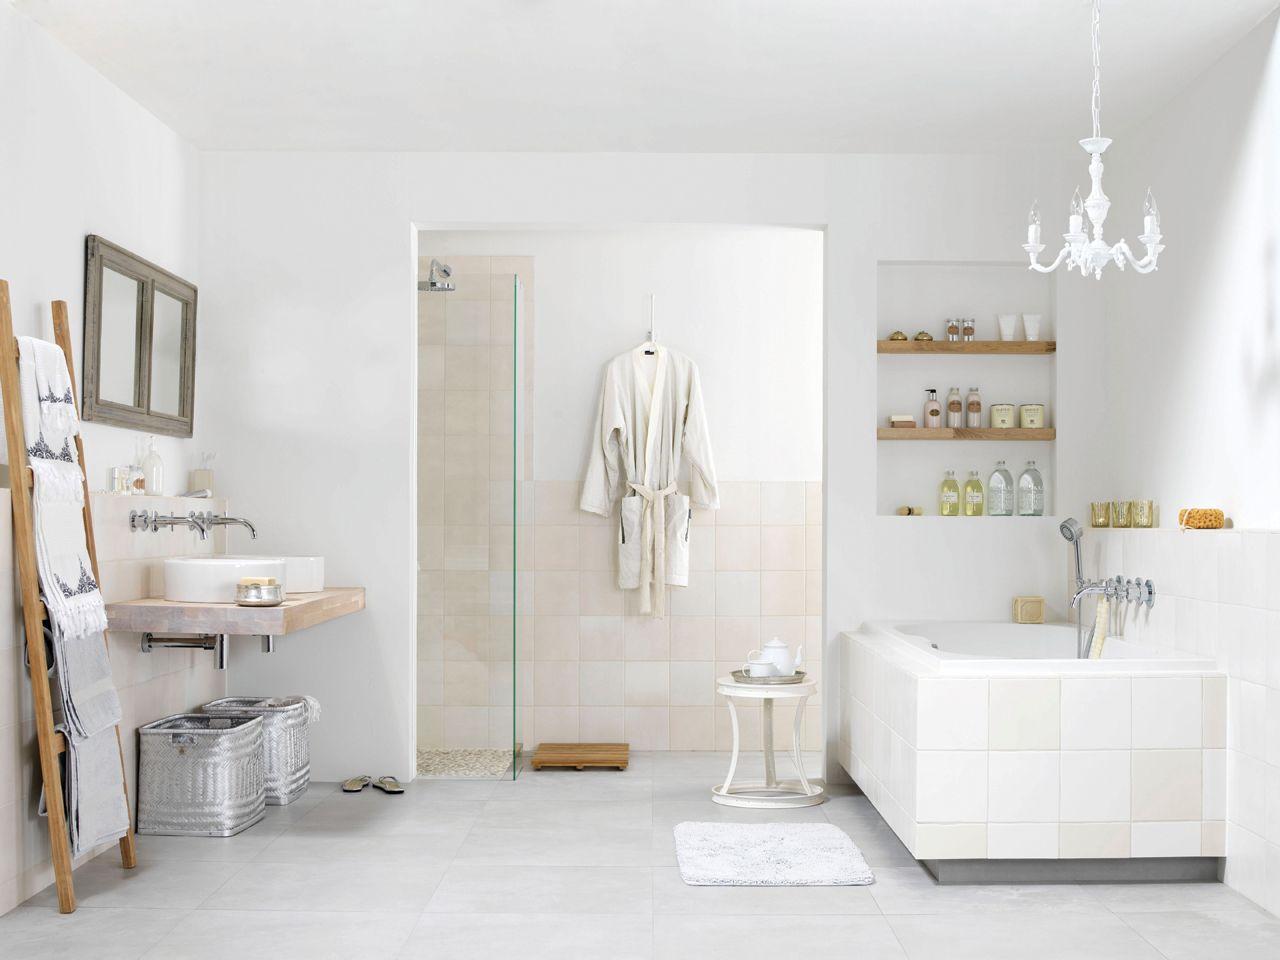 Badkamer Romance - Grando Keukens & Bad Zaandam - Ruimtelijk wit ...